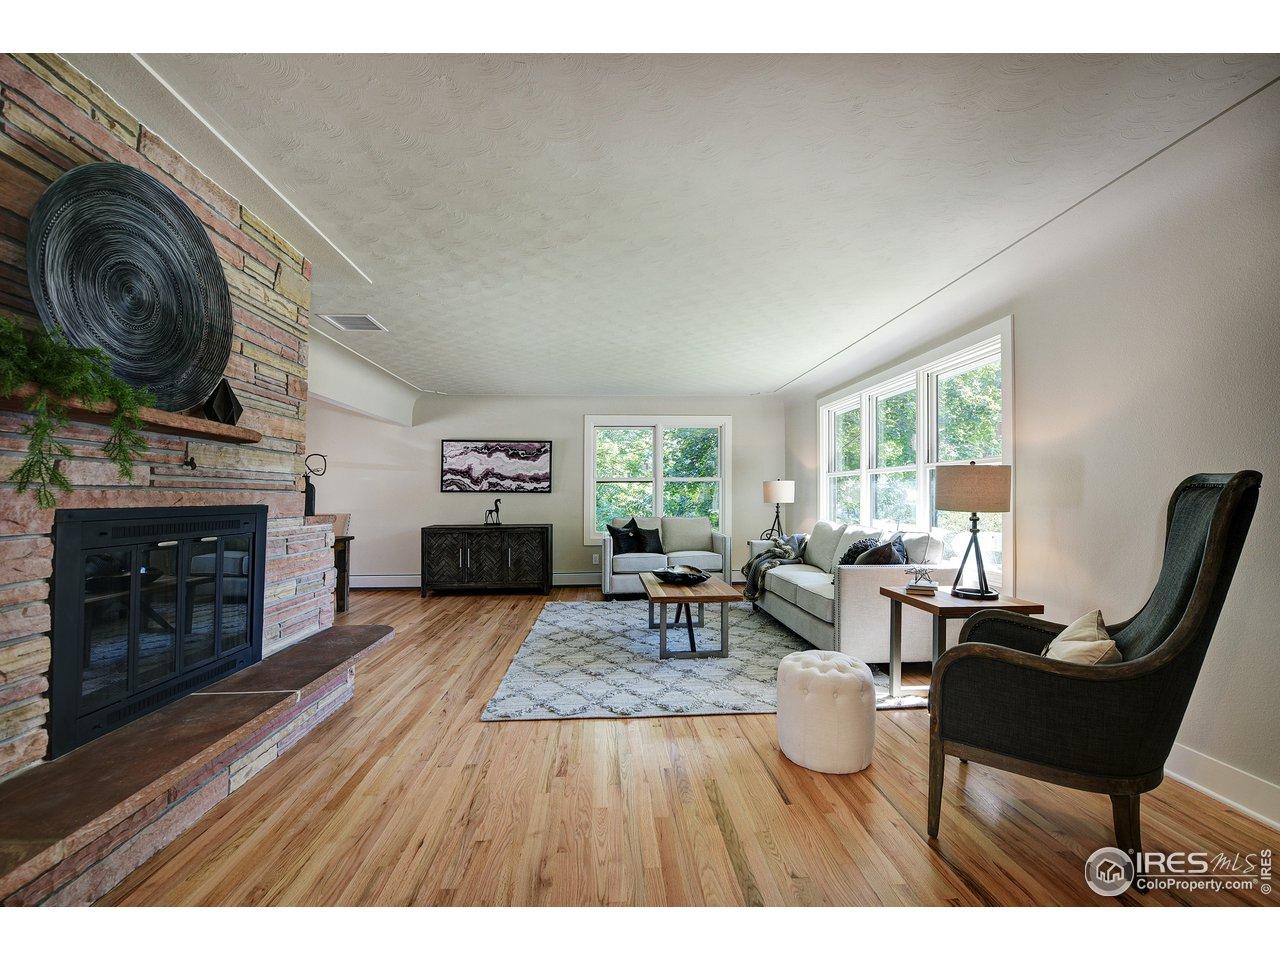 Hardwood floors throughout main floor